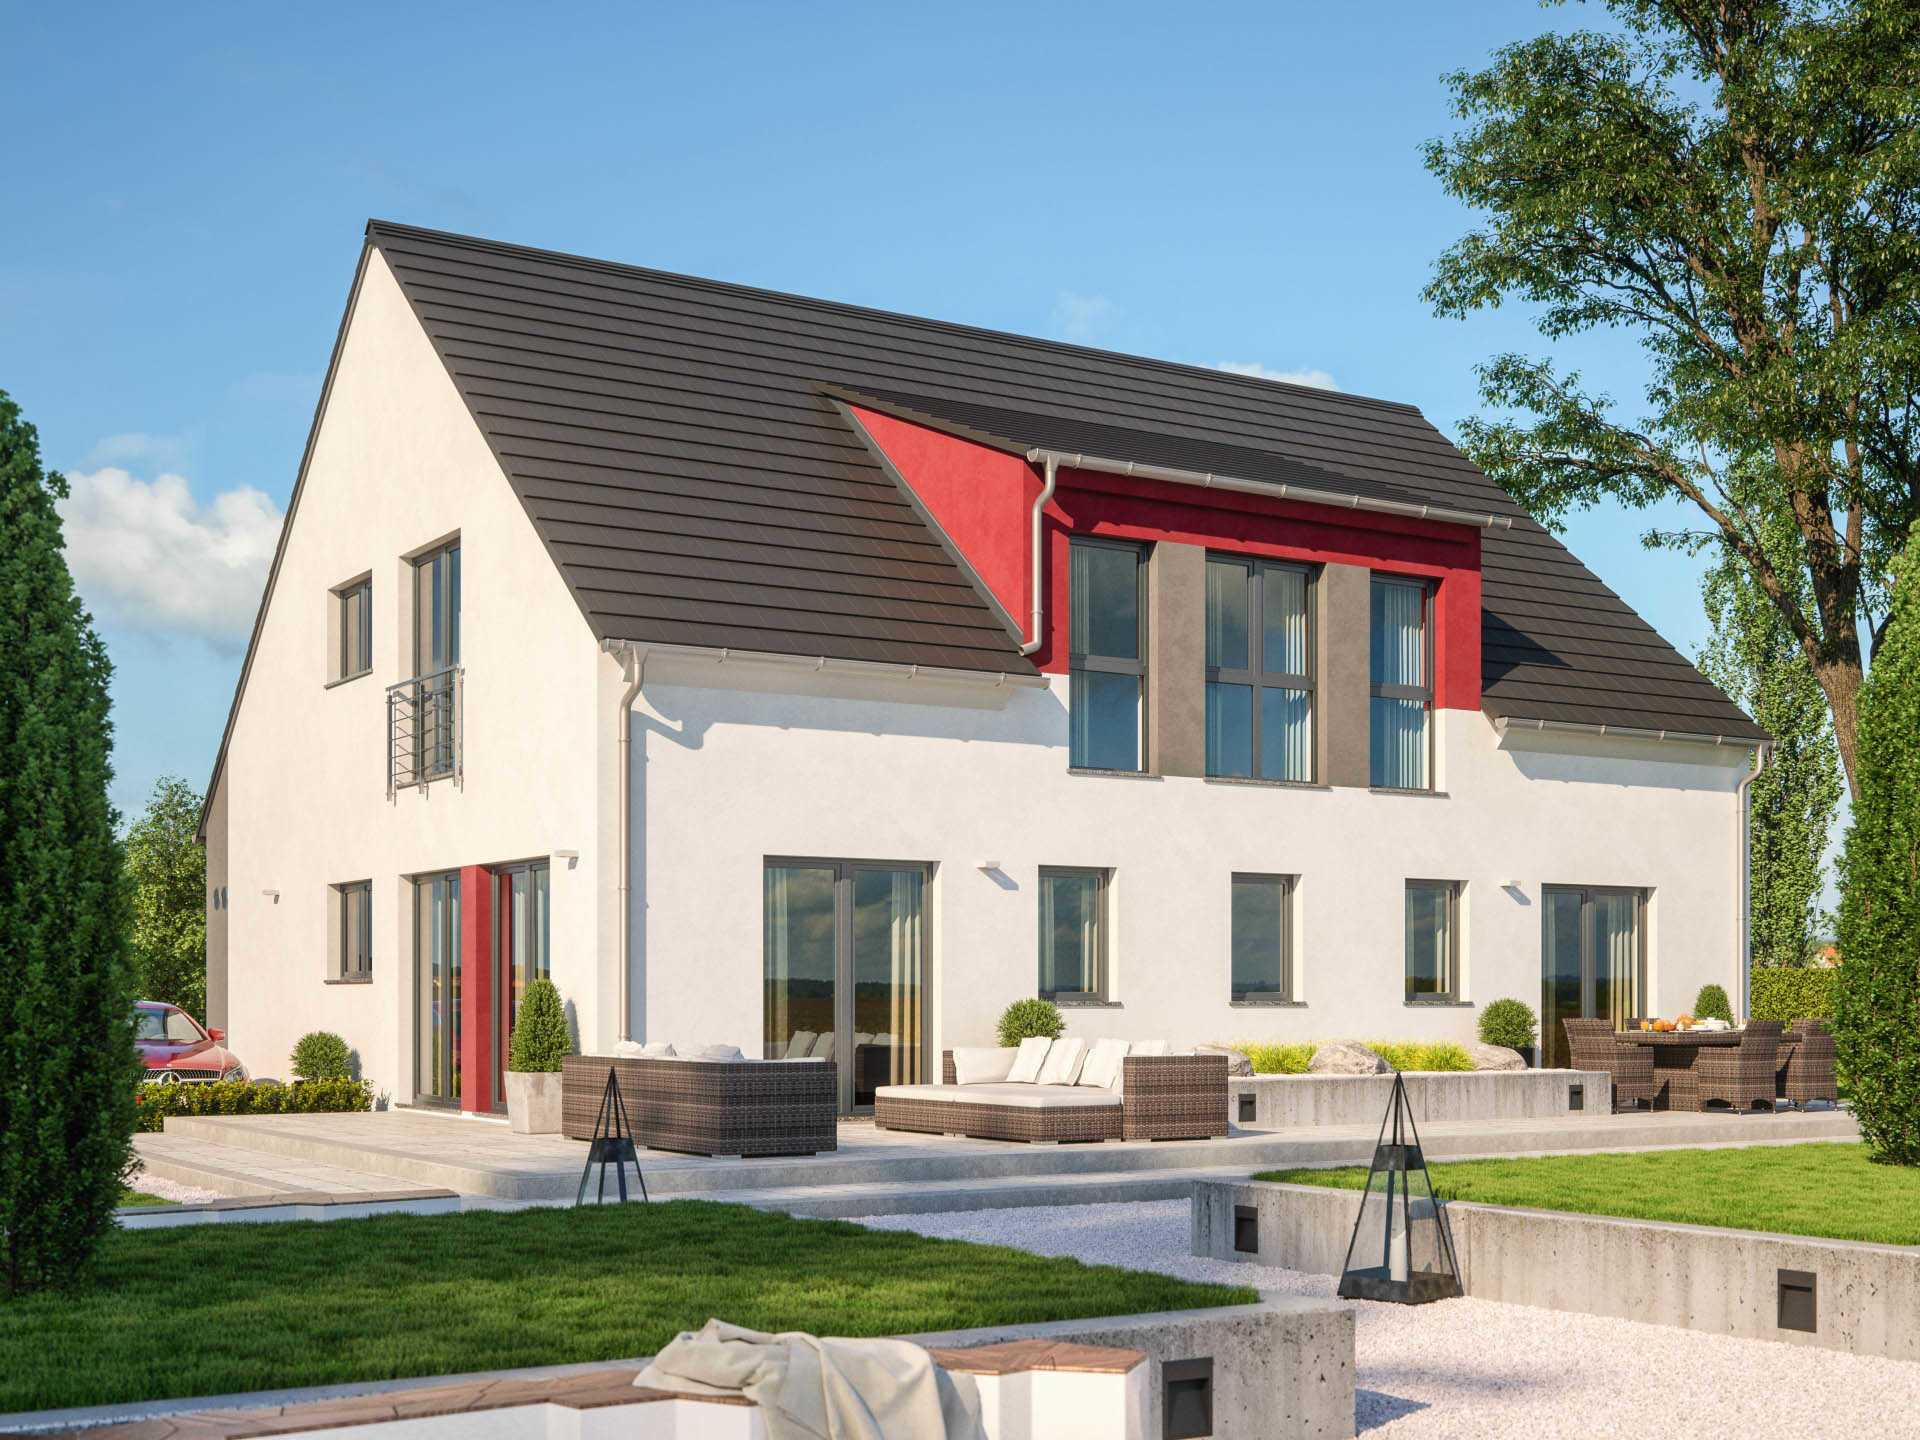 zweifamilienhaus clou 254 rensch haus. Black Bedroom Furniture Sets. Home Design Ideas